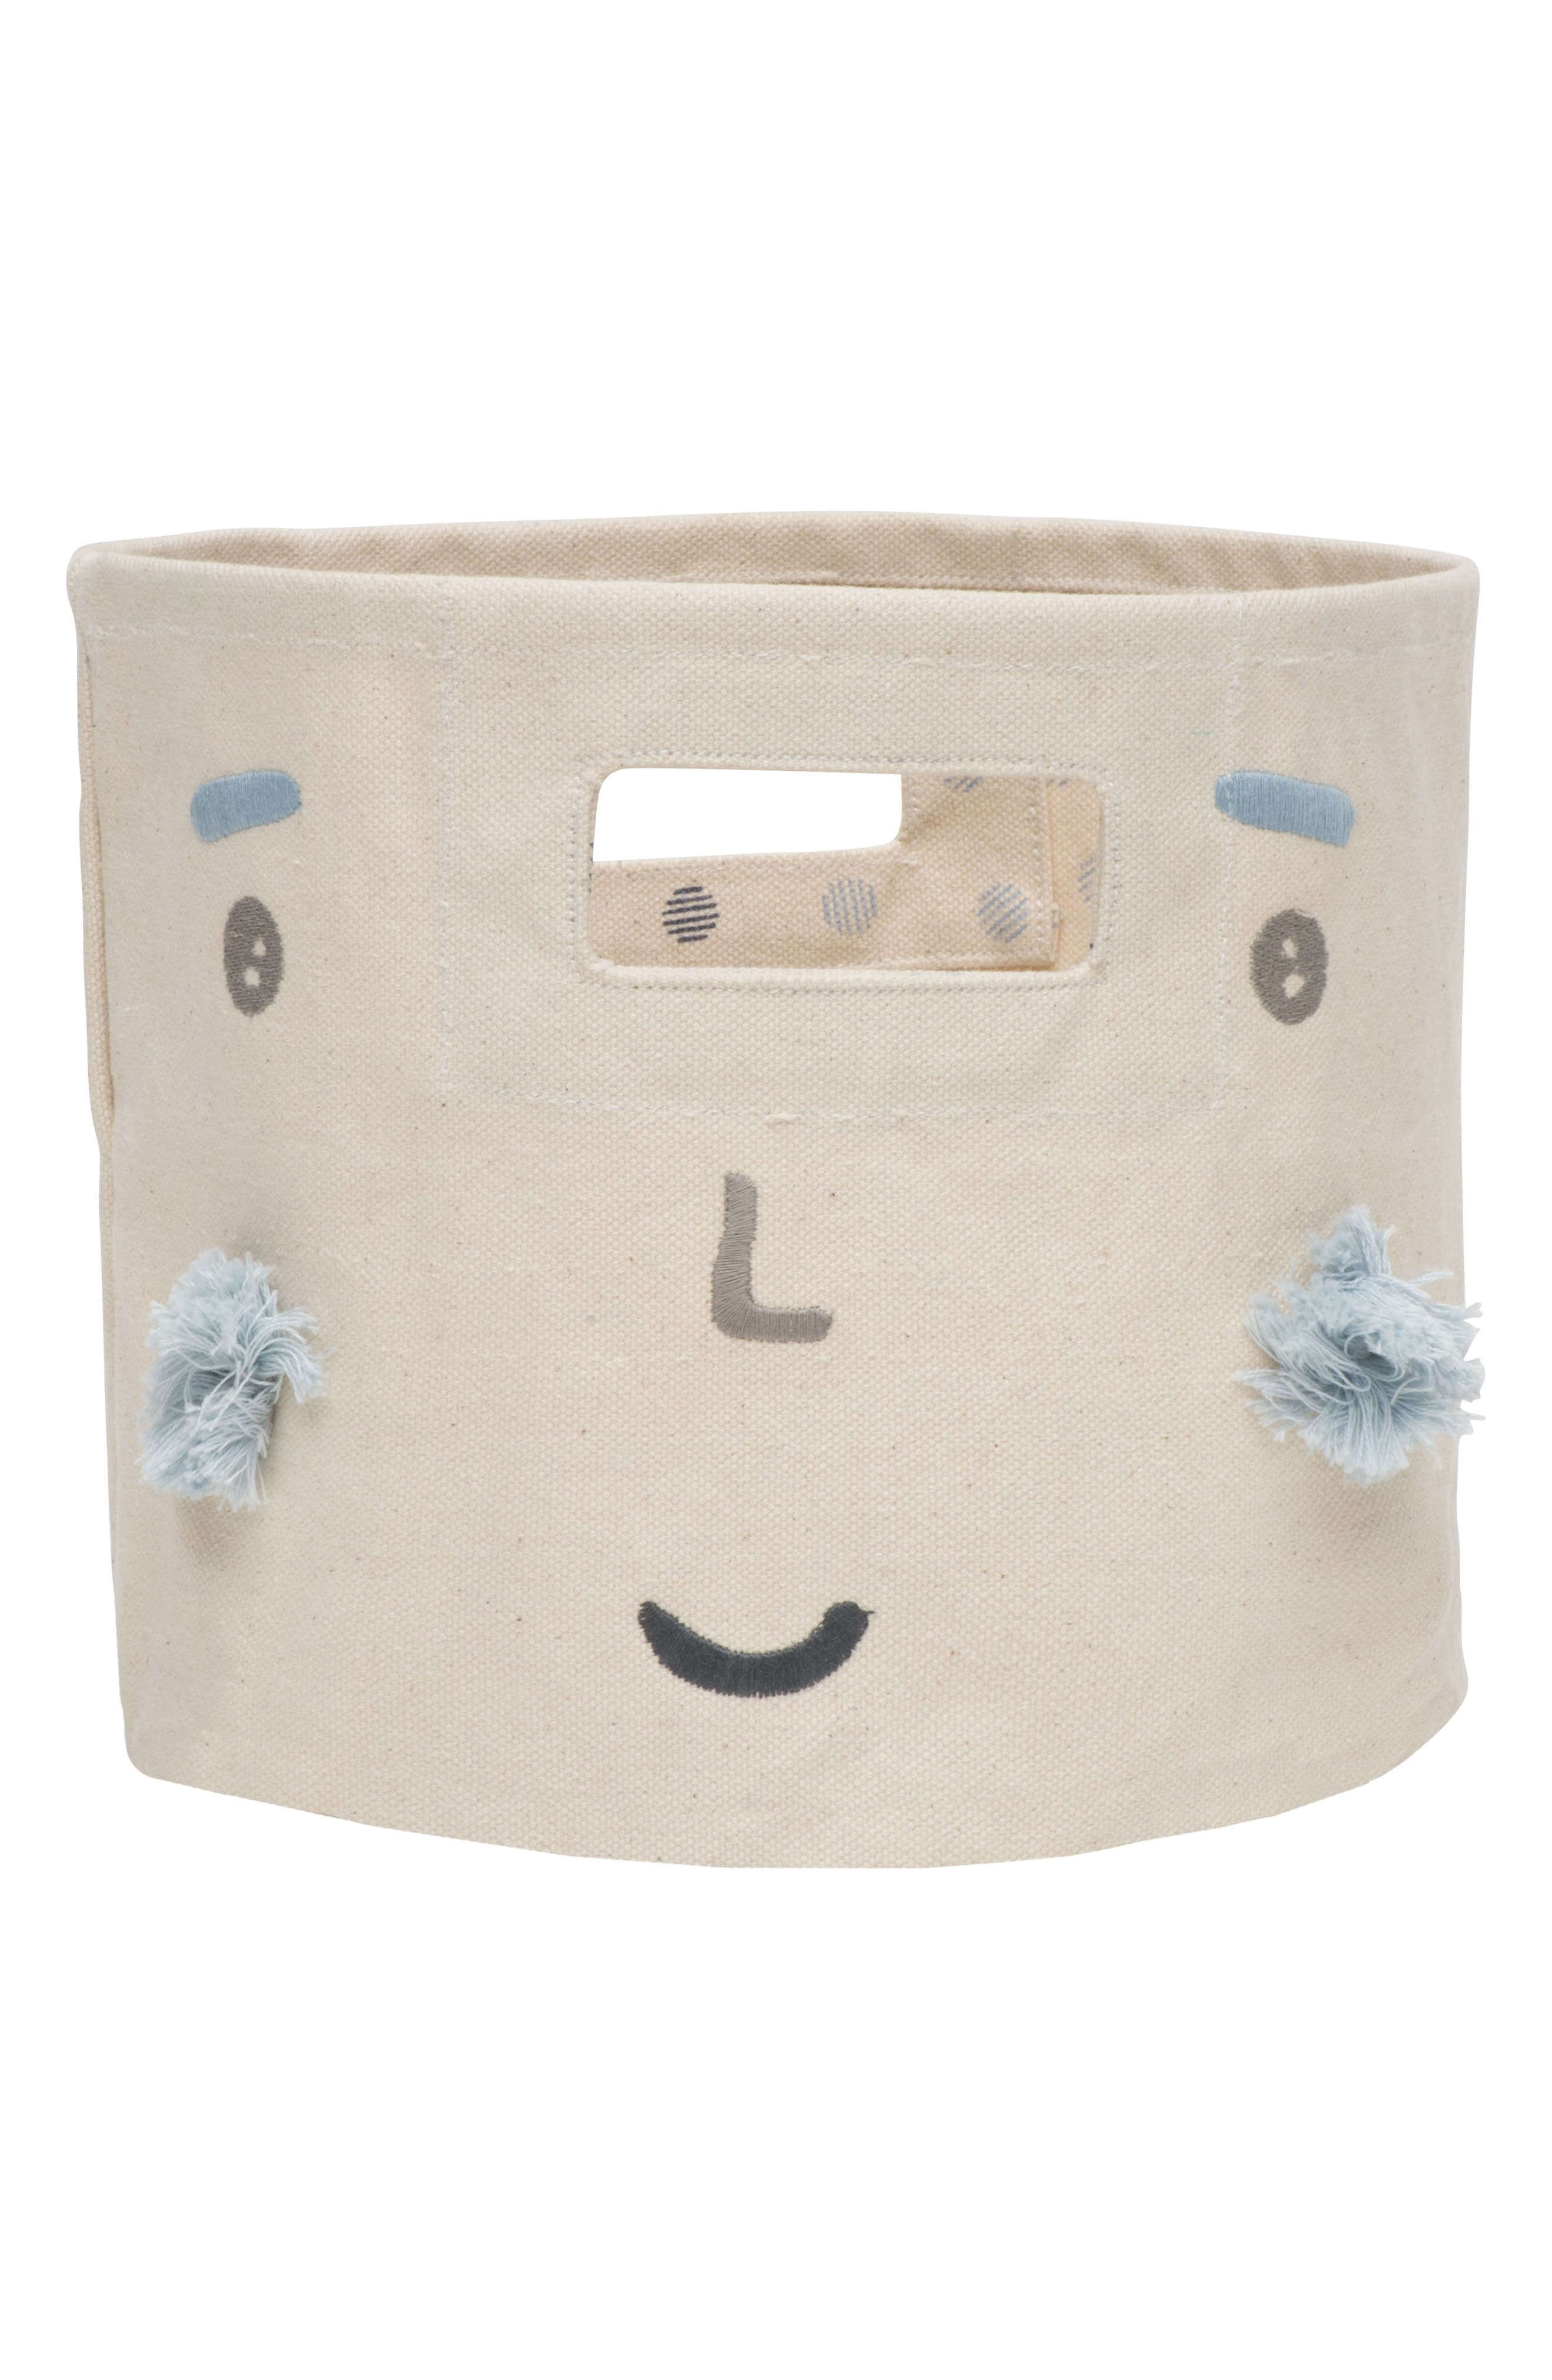 Peek-A-Boo Boy Mini Canvas Bin,                             Main thumbnail 1, color,                             Ivory